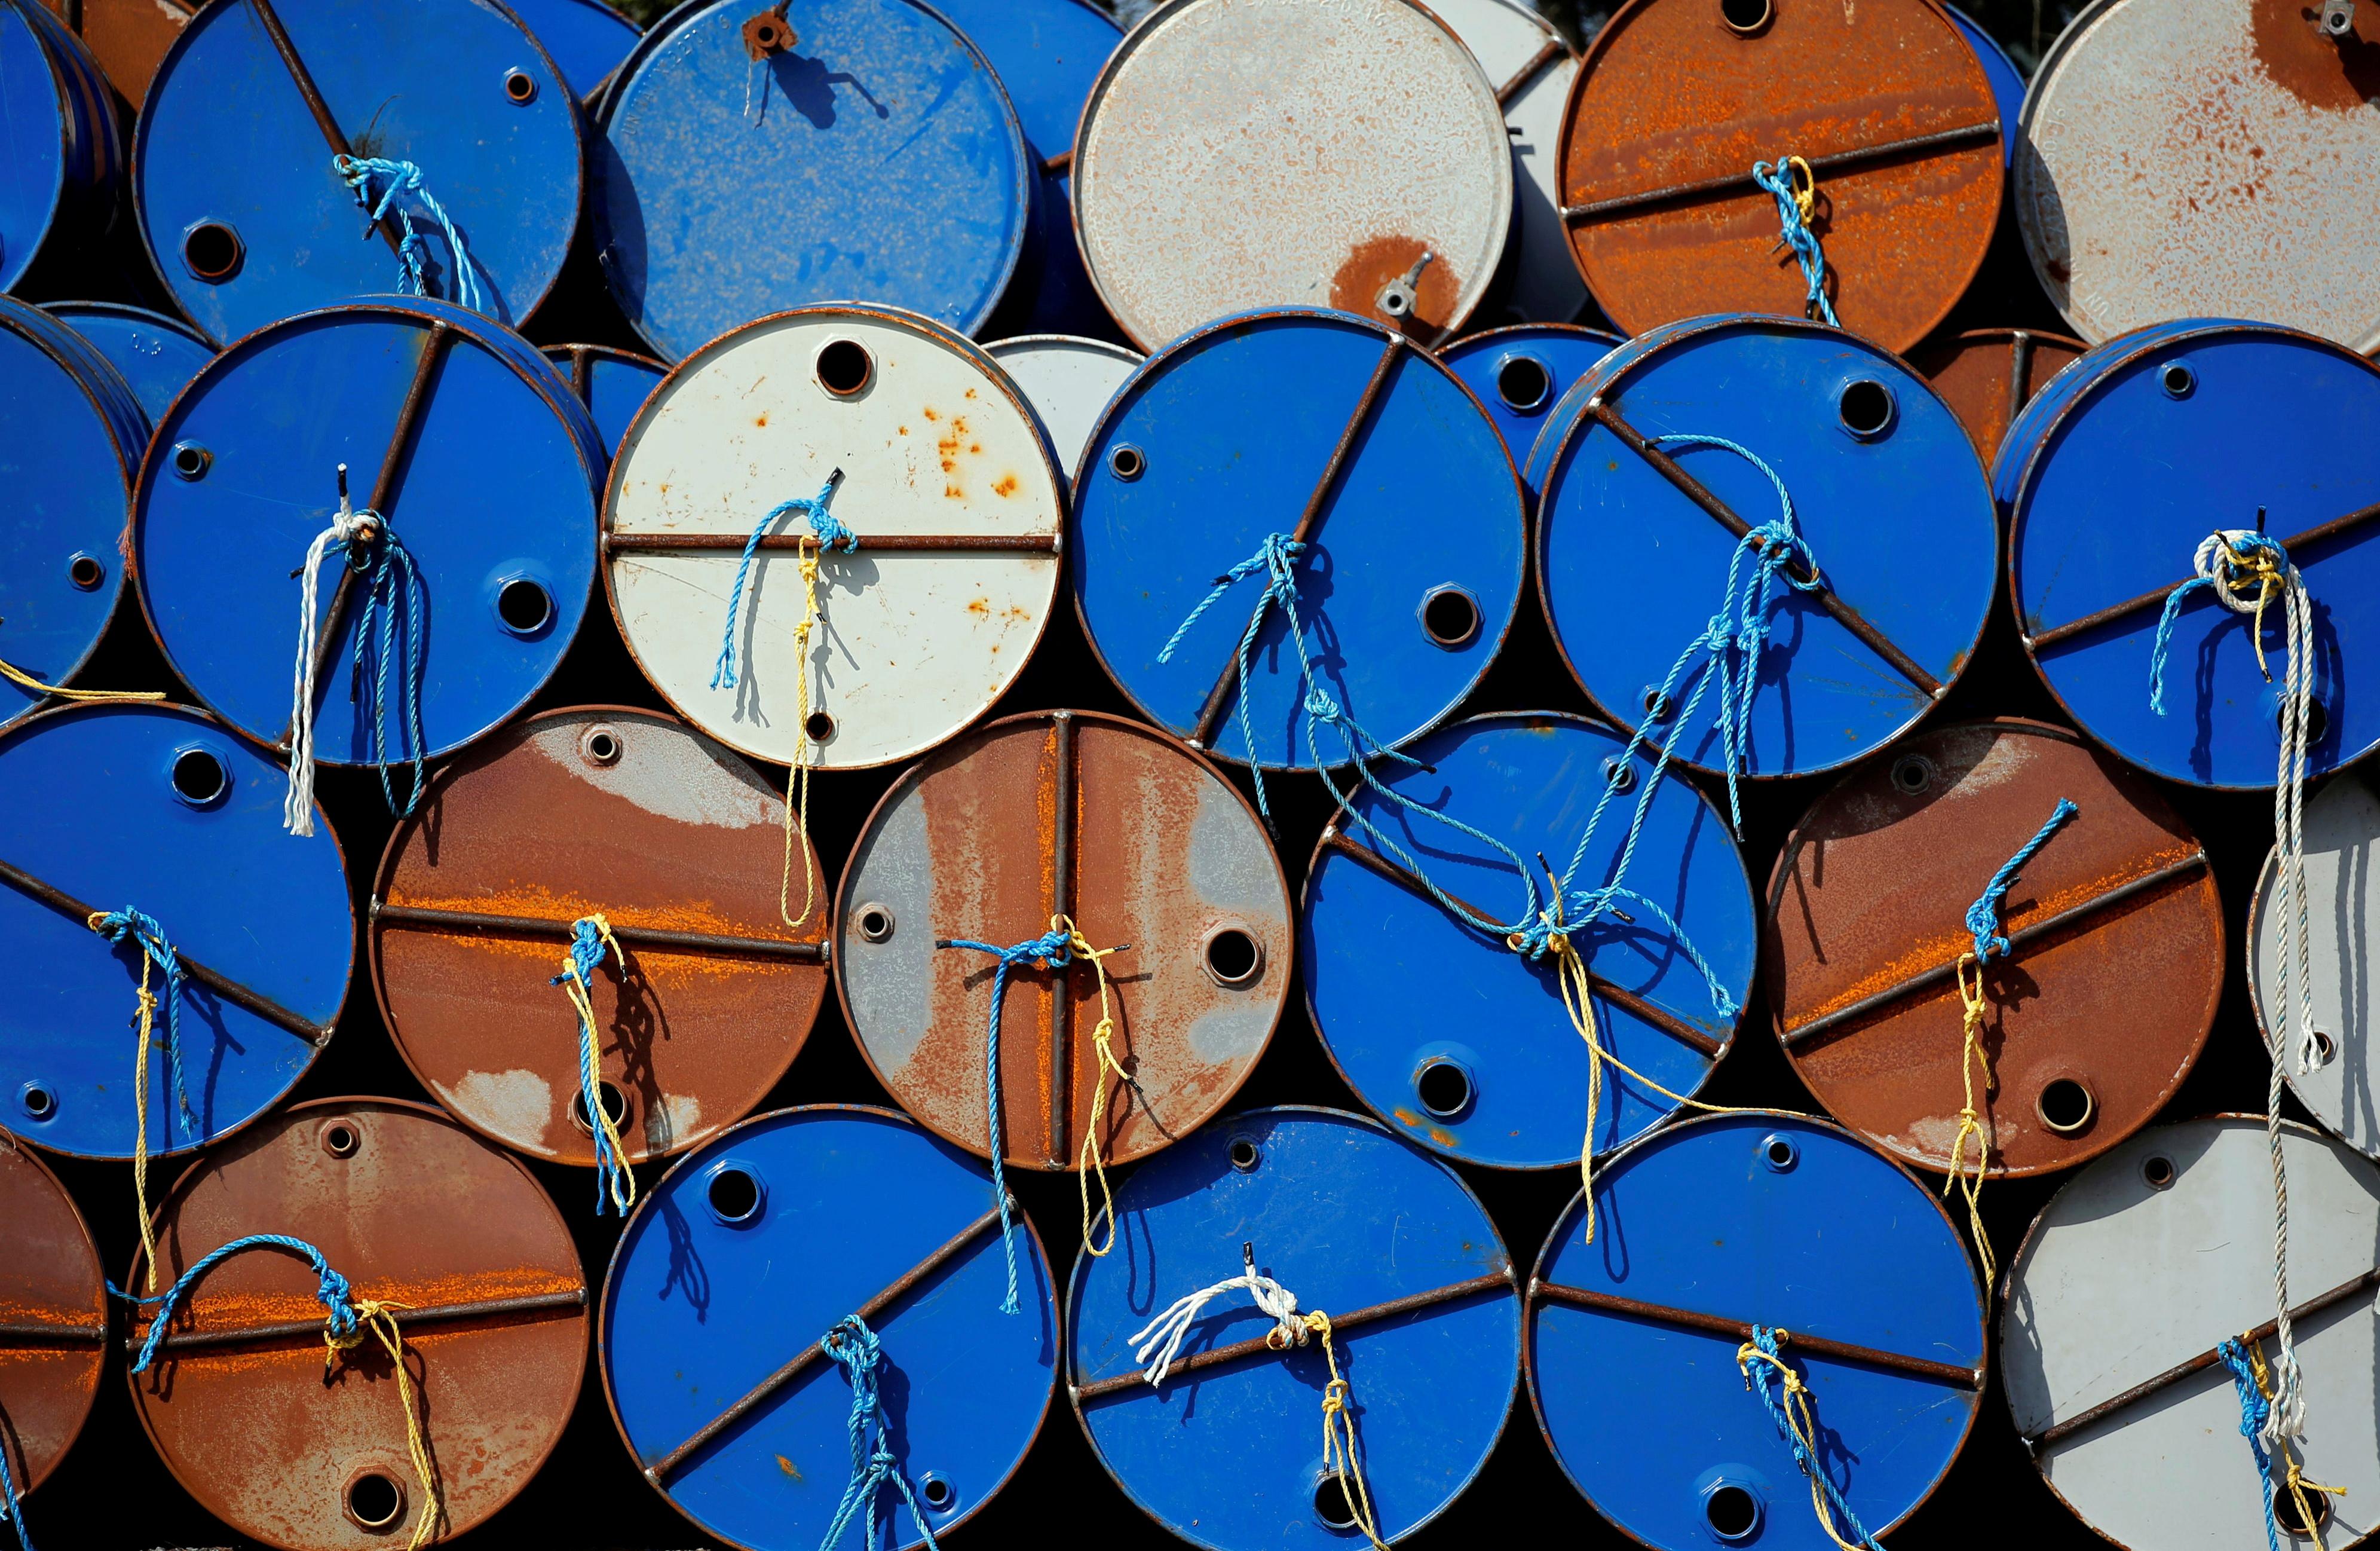 Oil barrels are pictured at the site of Canadian group Vermilion Energy in Parentis-en-Born, France, October 13, 2017. REUTERS/Regis Duvignau